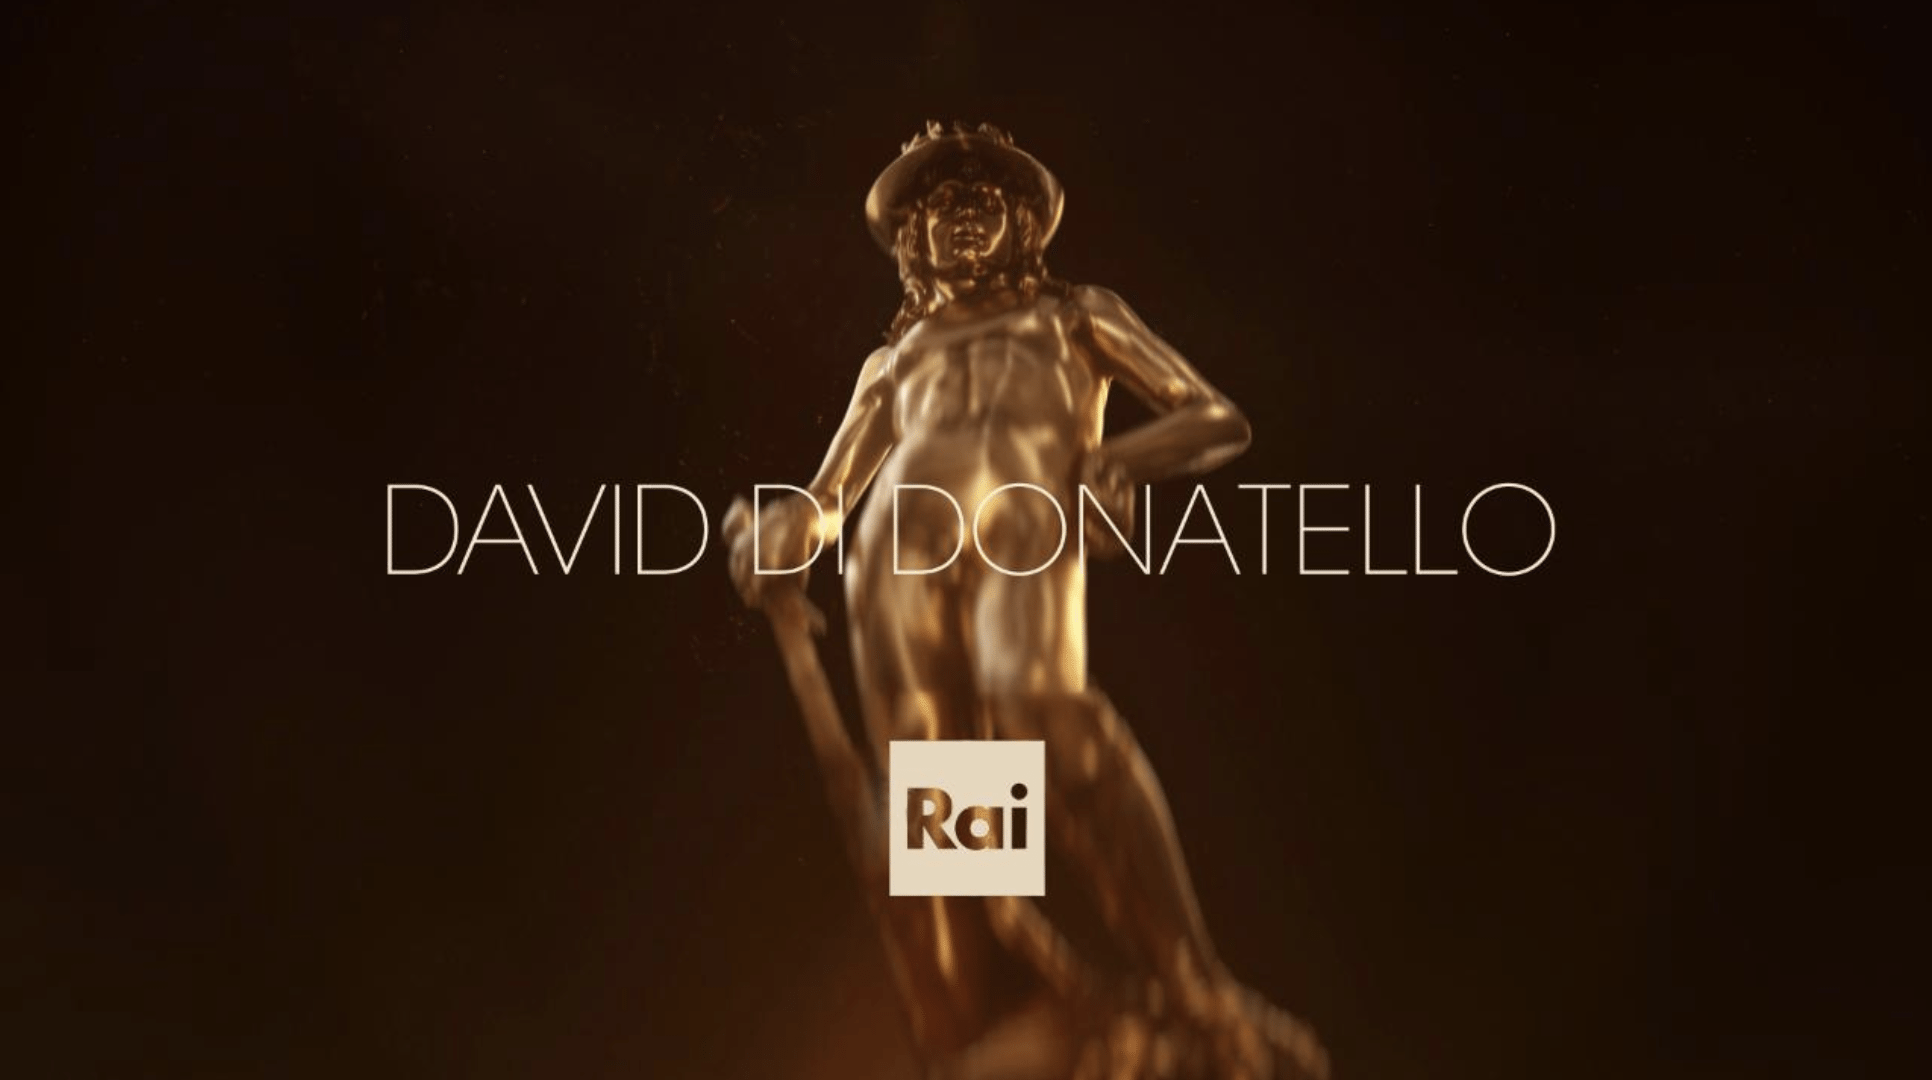 DaviddiDonatello2018ifilmcandidati_gerardinadimassa_21secolonews